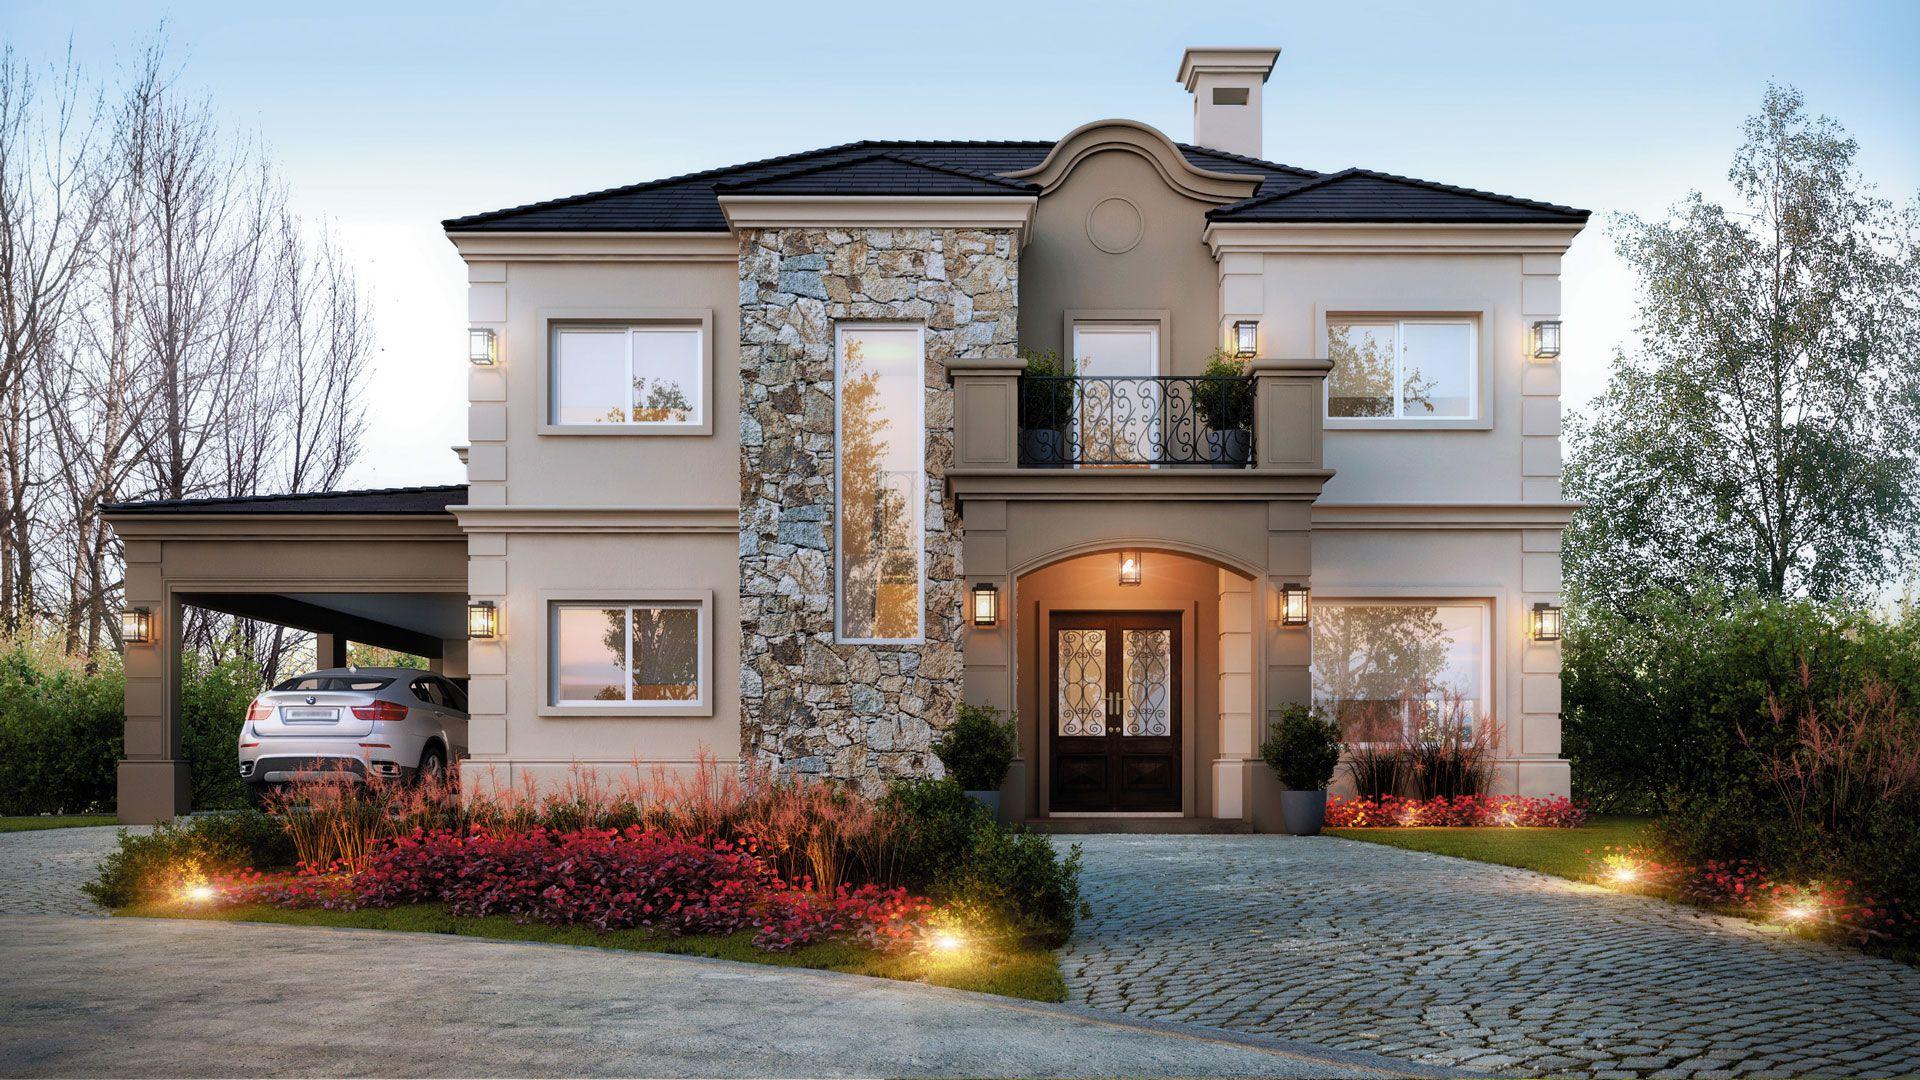 Estudio nf y asociados estilo cl sico moderno casa for Casas modernas clasicas